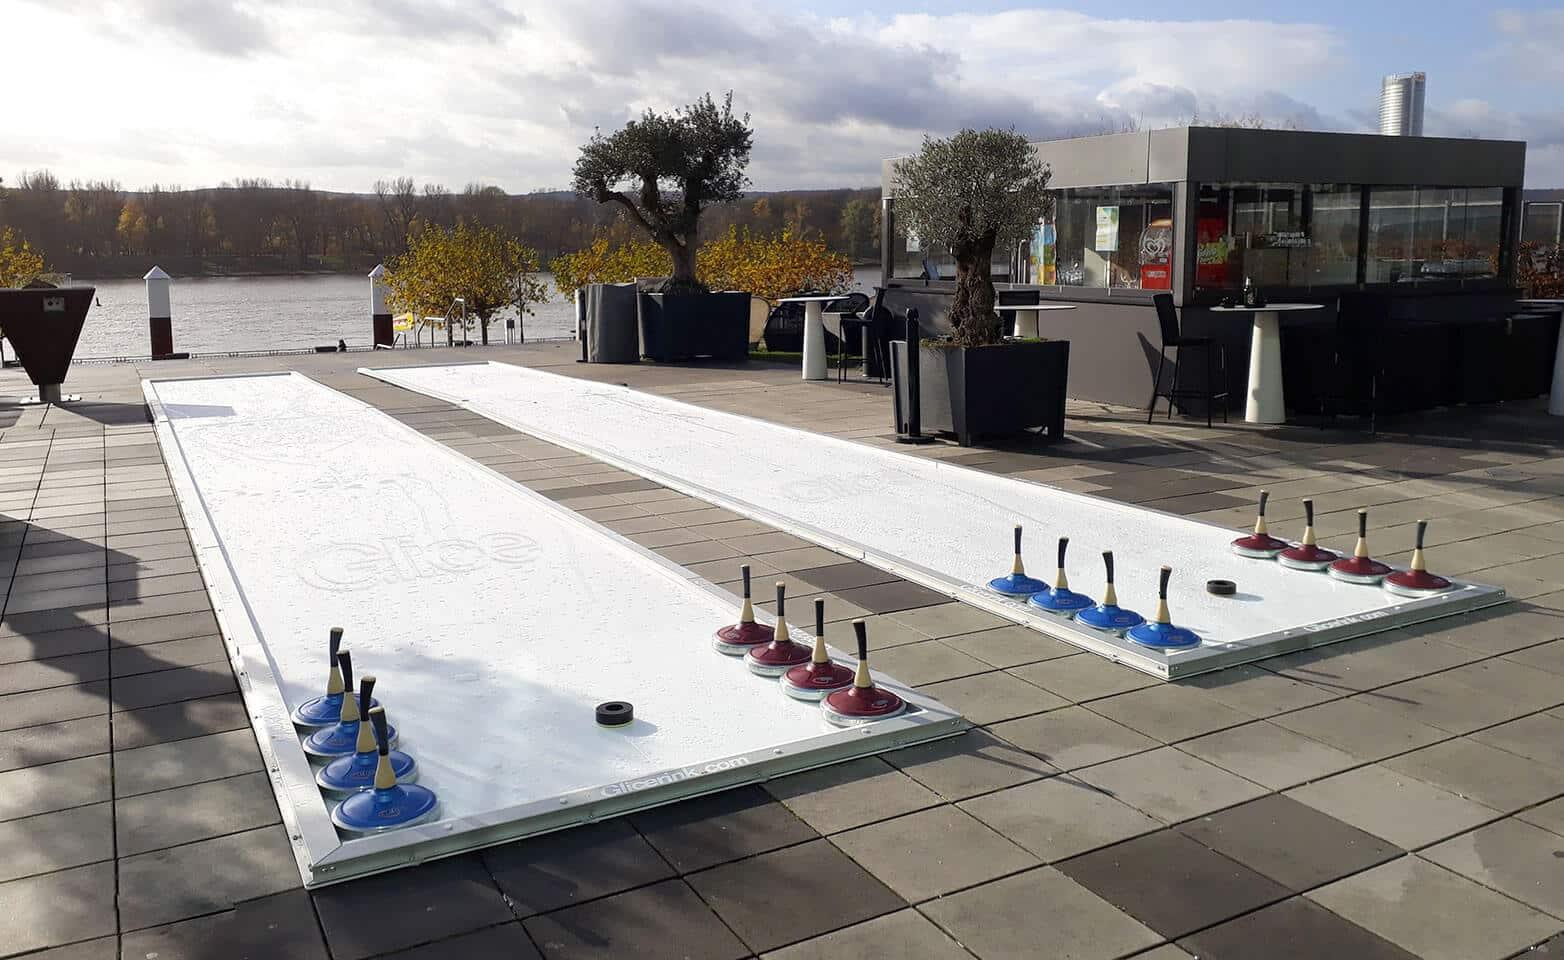 Artificial Eisstock tracks at German 5 Star Hotel Kameha in Bonn